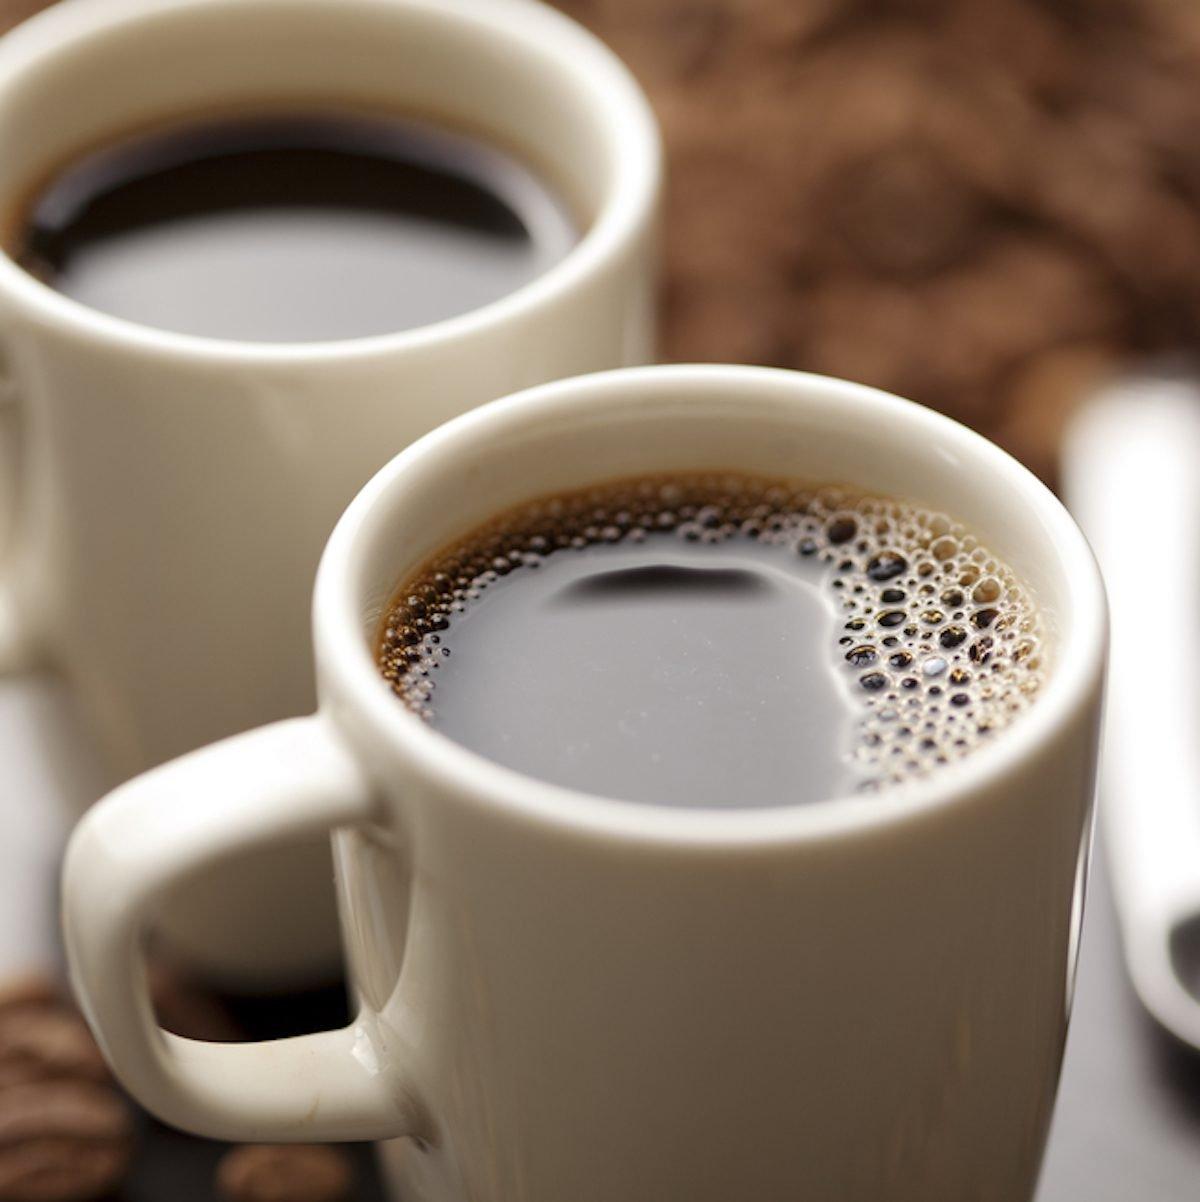 12 CoffeeTaste Home Mistakes Brewing Of Makes When Everyone Tlc3KJuF1